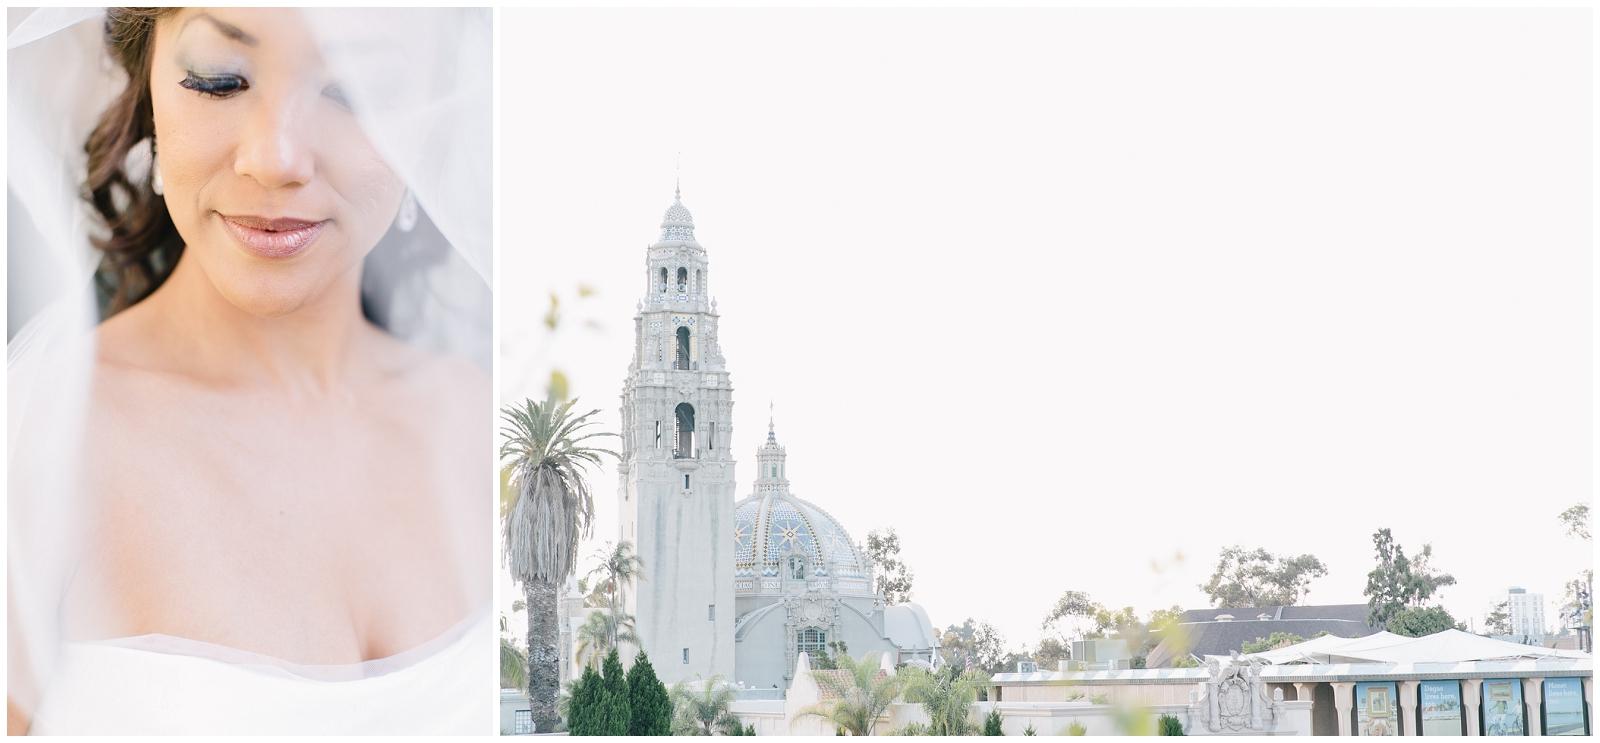 San-Francisco-Bay-Area-Wedding-Photography-Destination-14.jpg